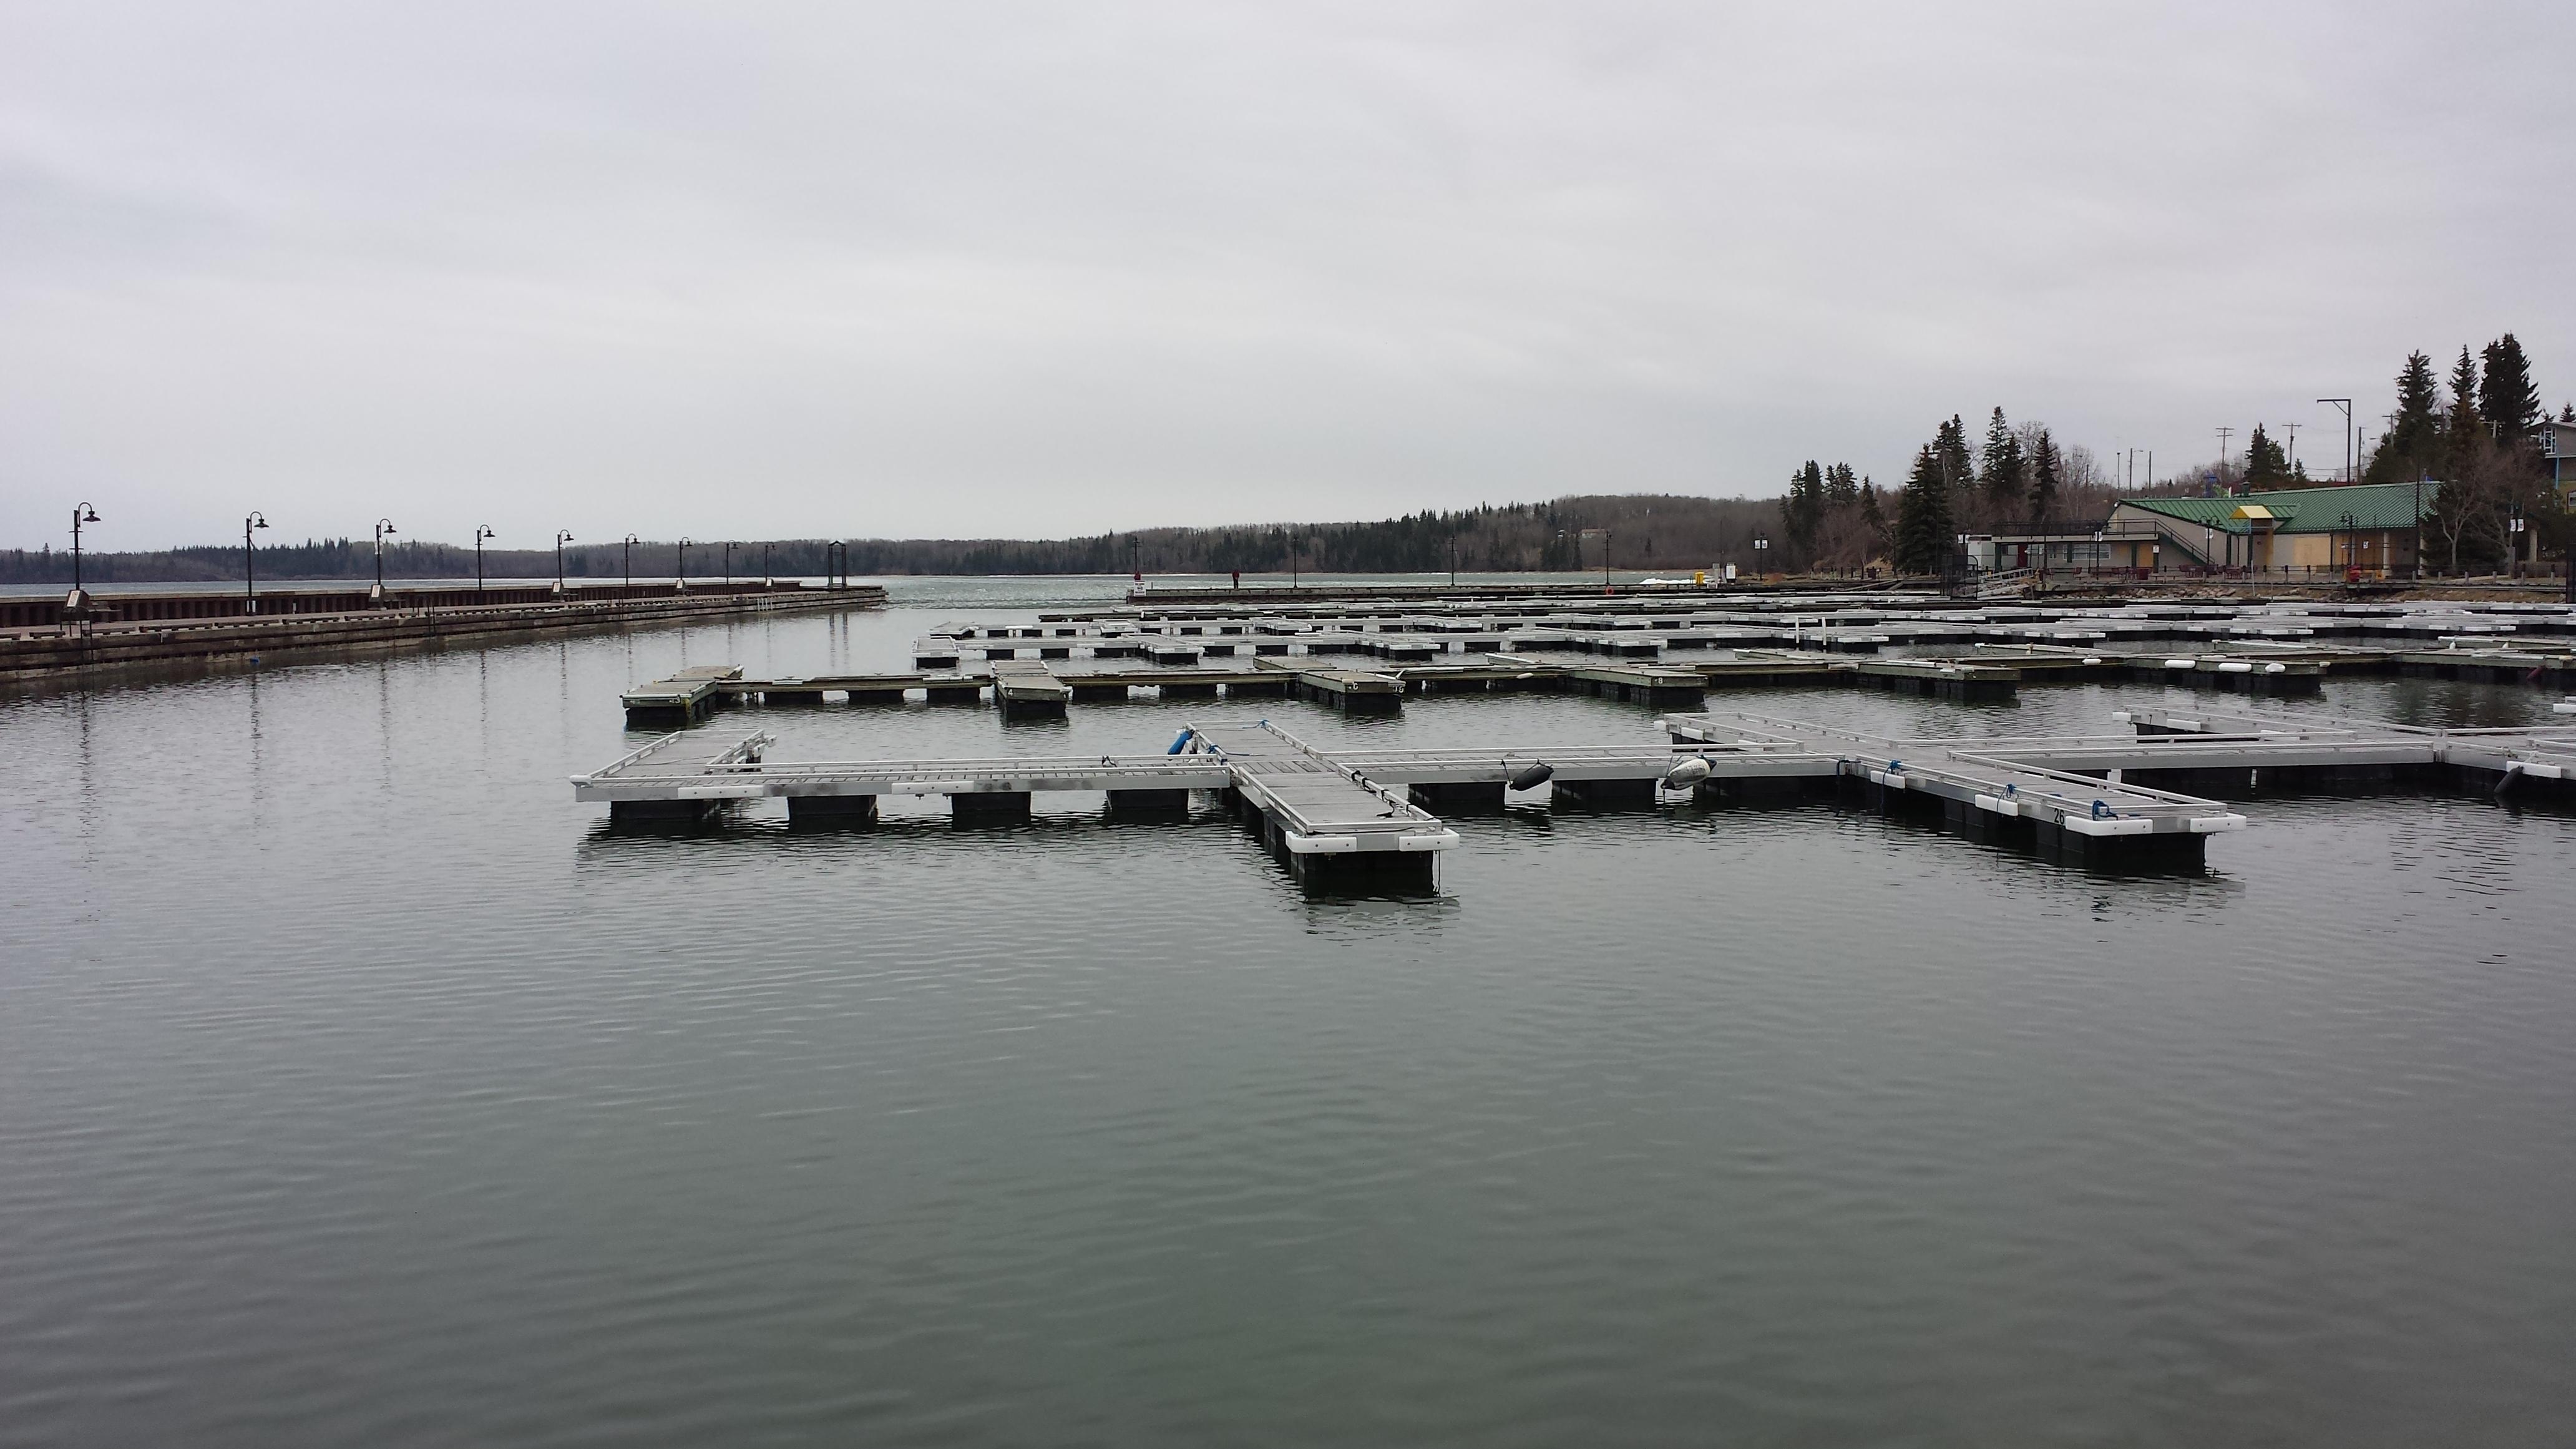 Waterfront Docks